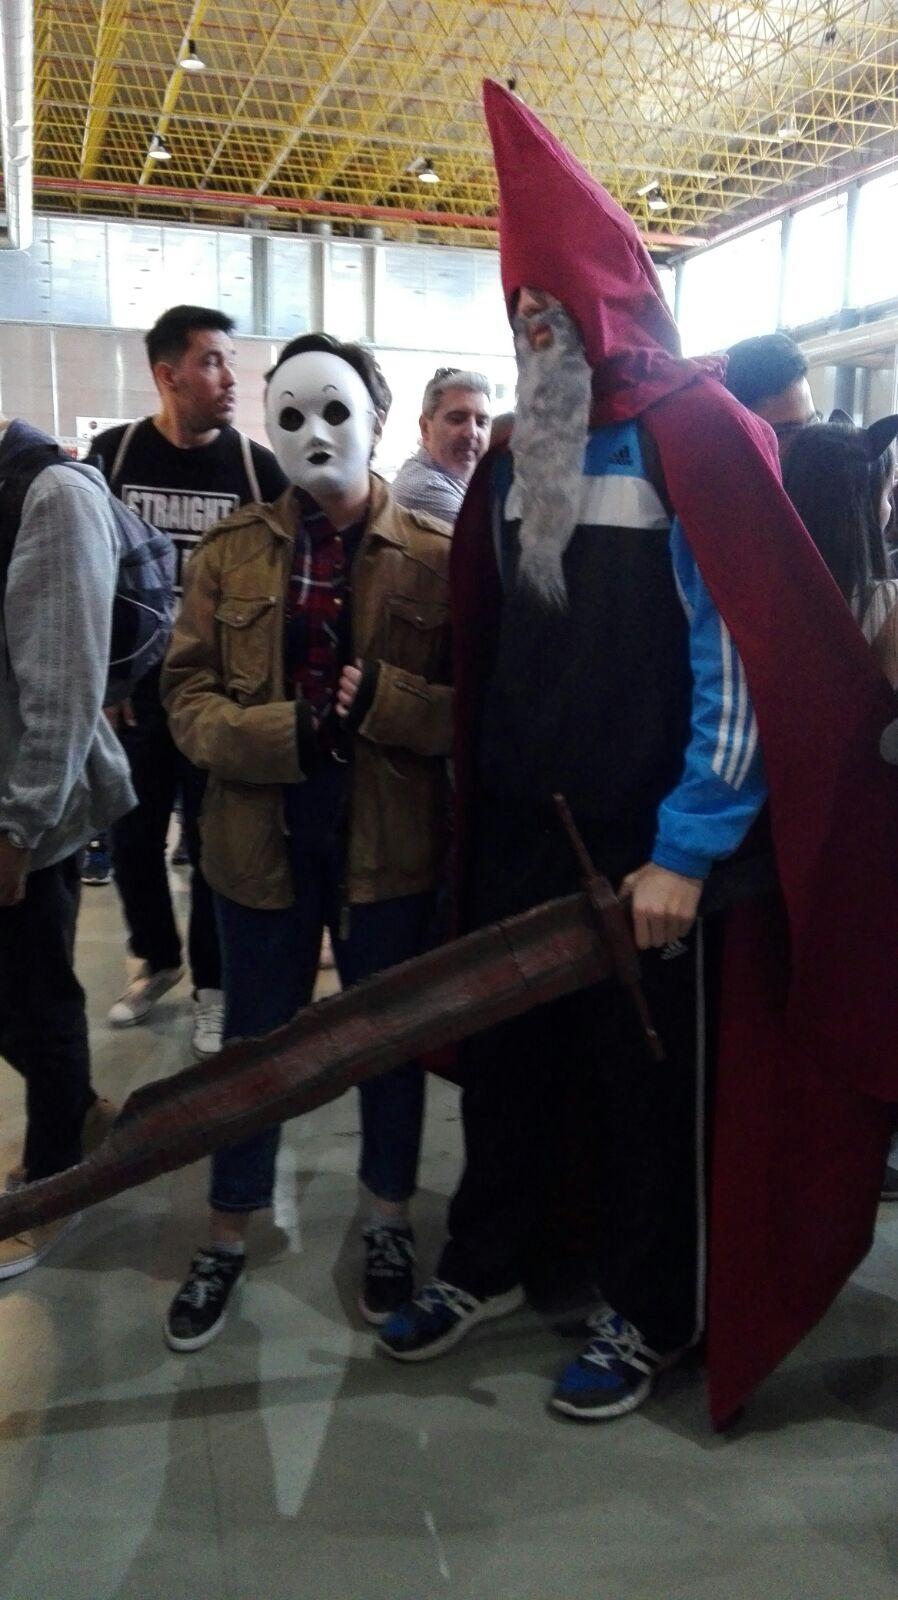 cosplay on marblehornetsfc deviantart